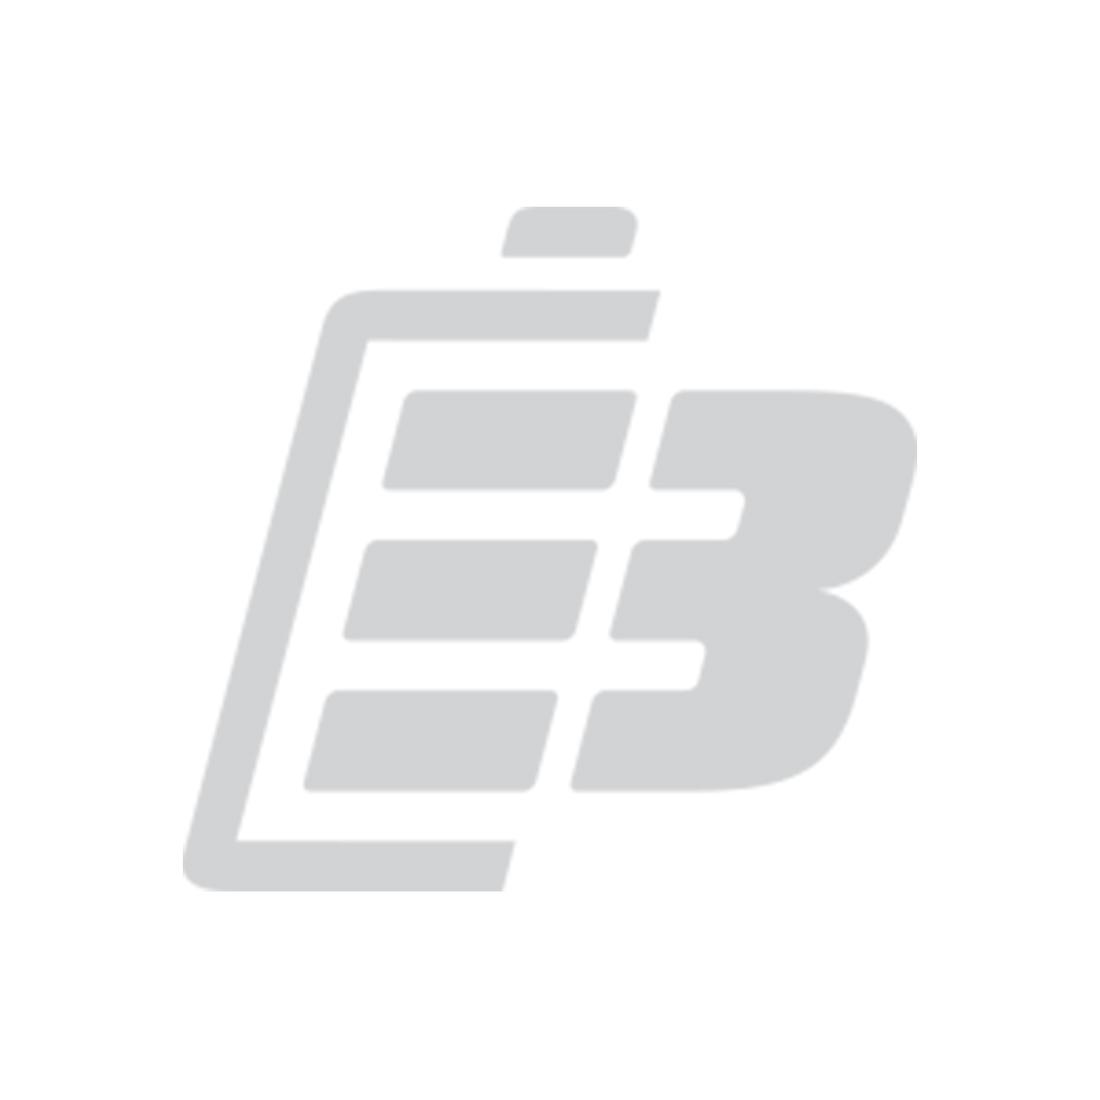 Laptop battery Acer Aspire 6930_1